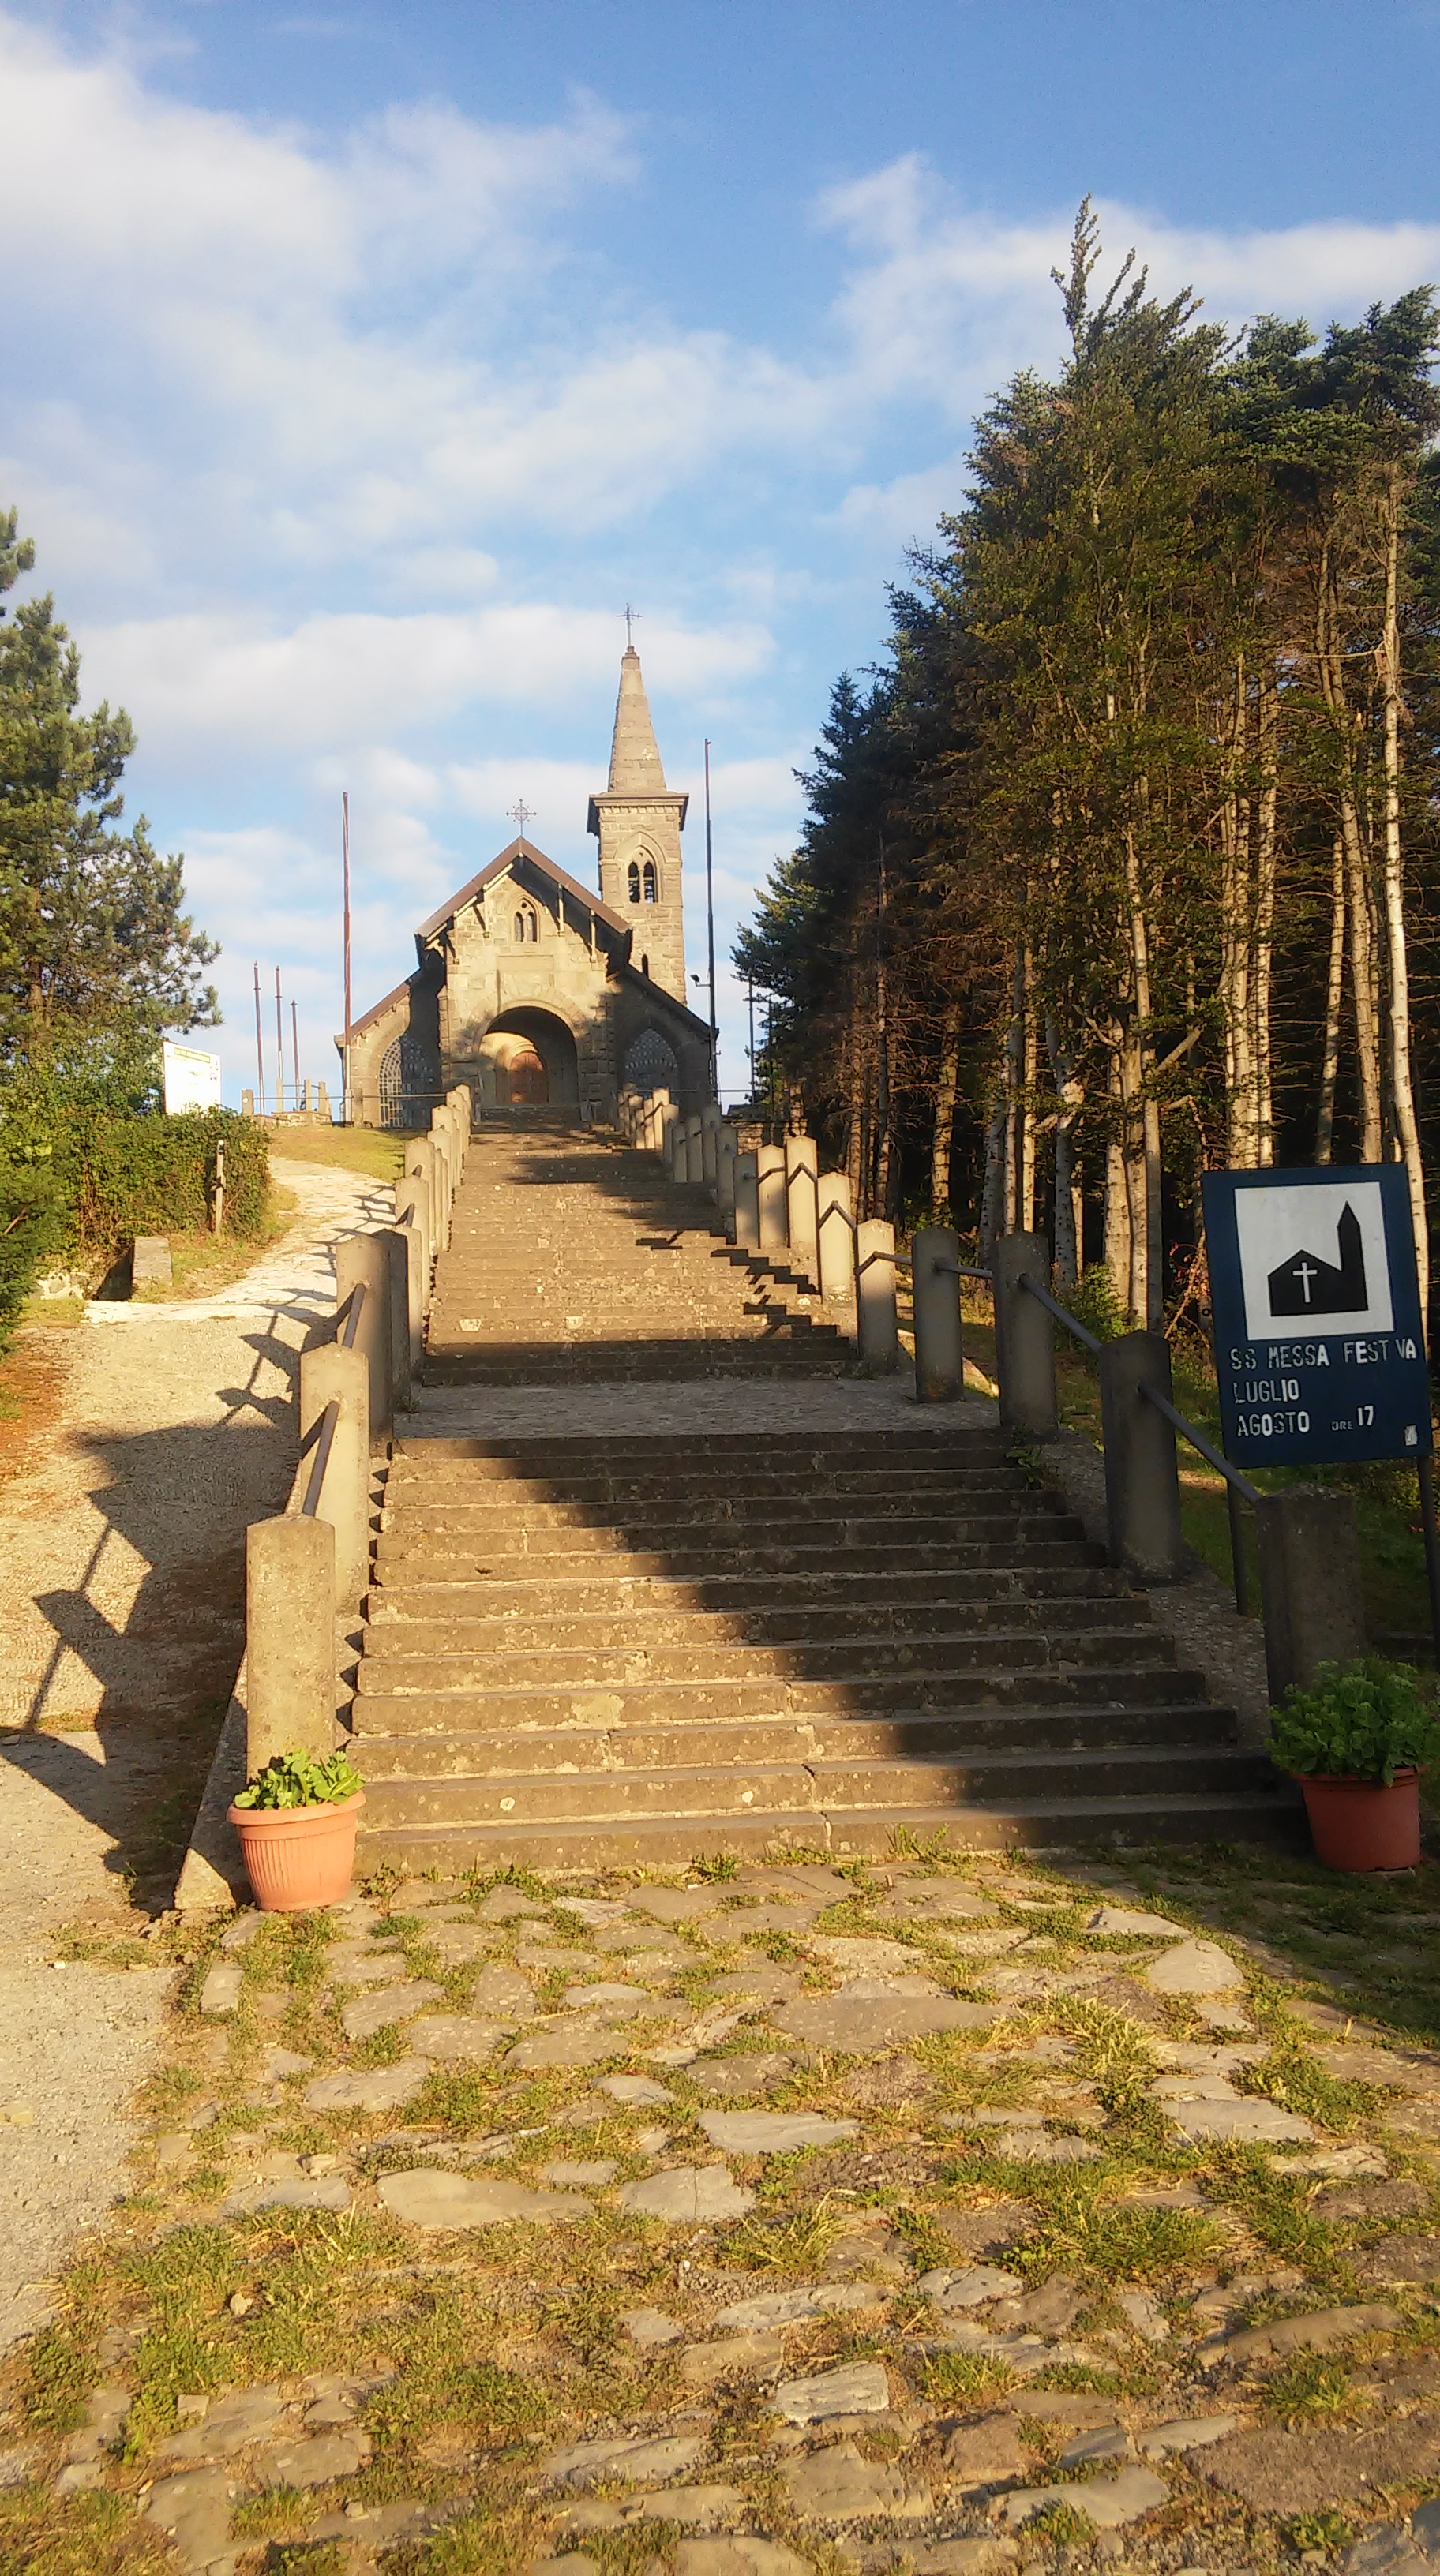 TAPPA 5: CISA – PONTREMOLI